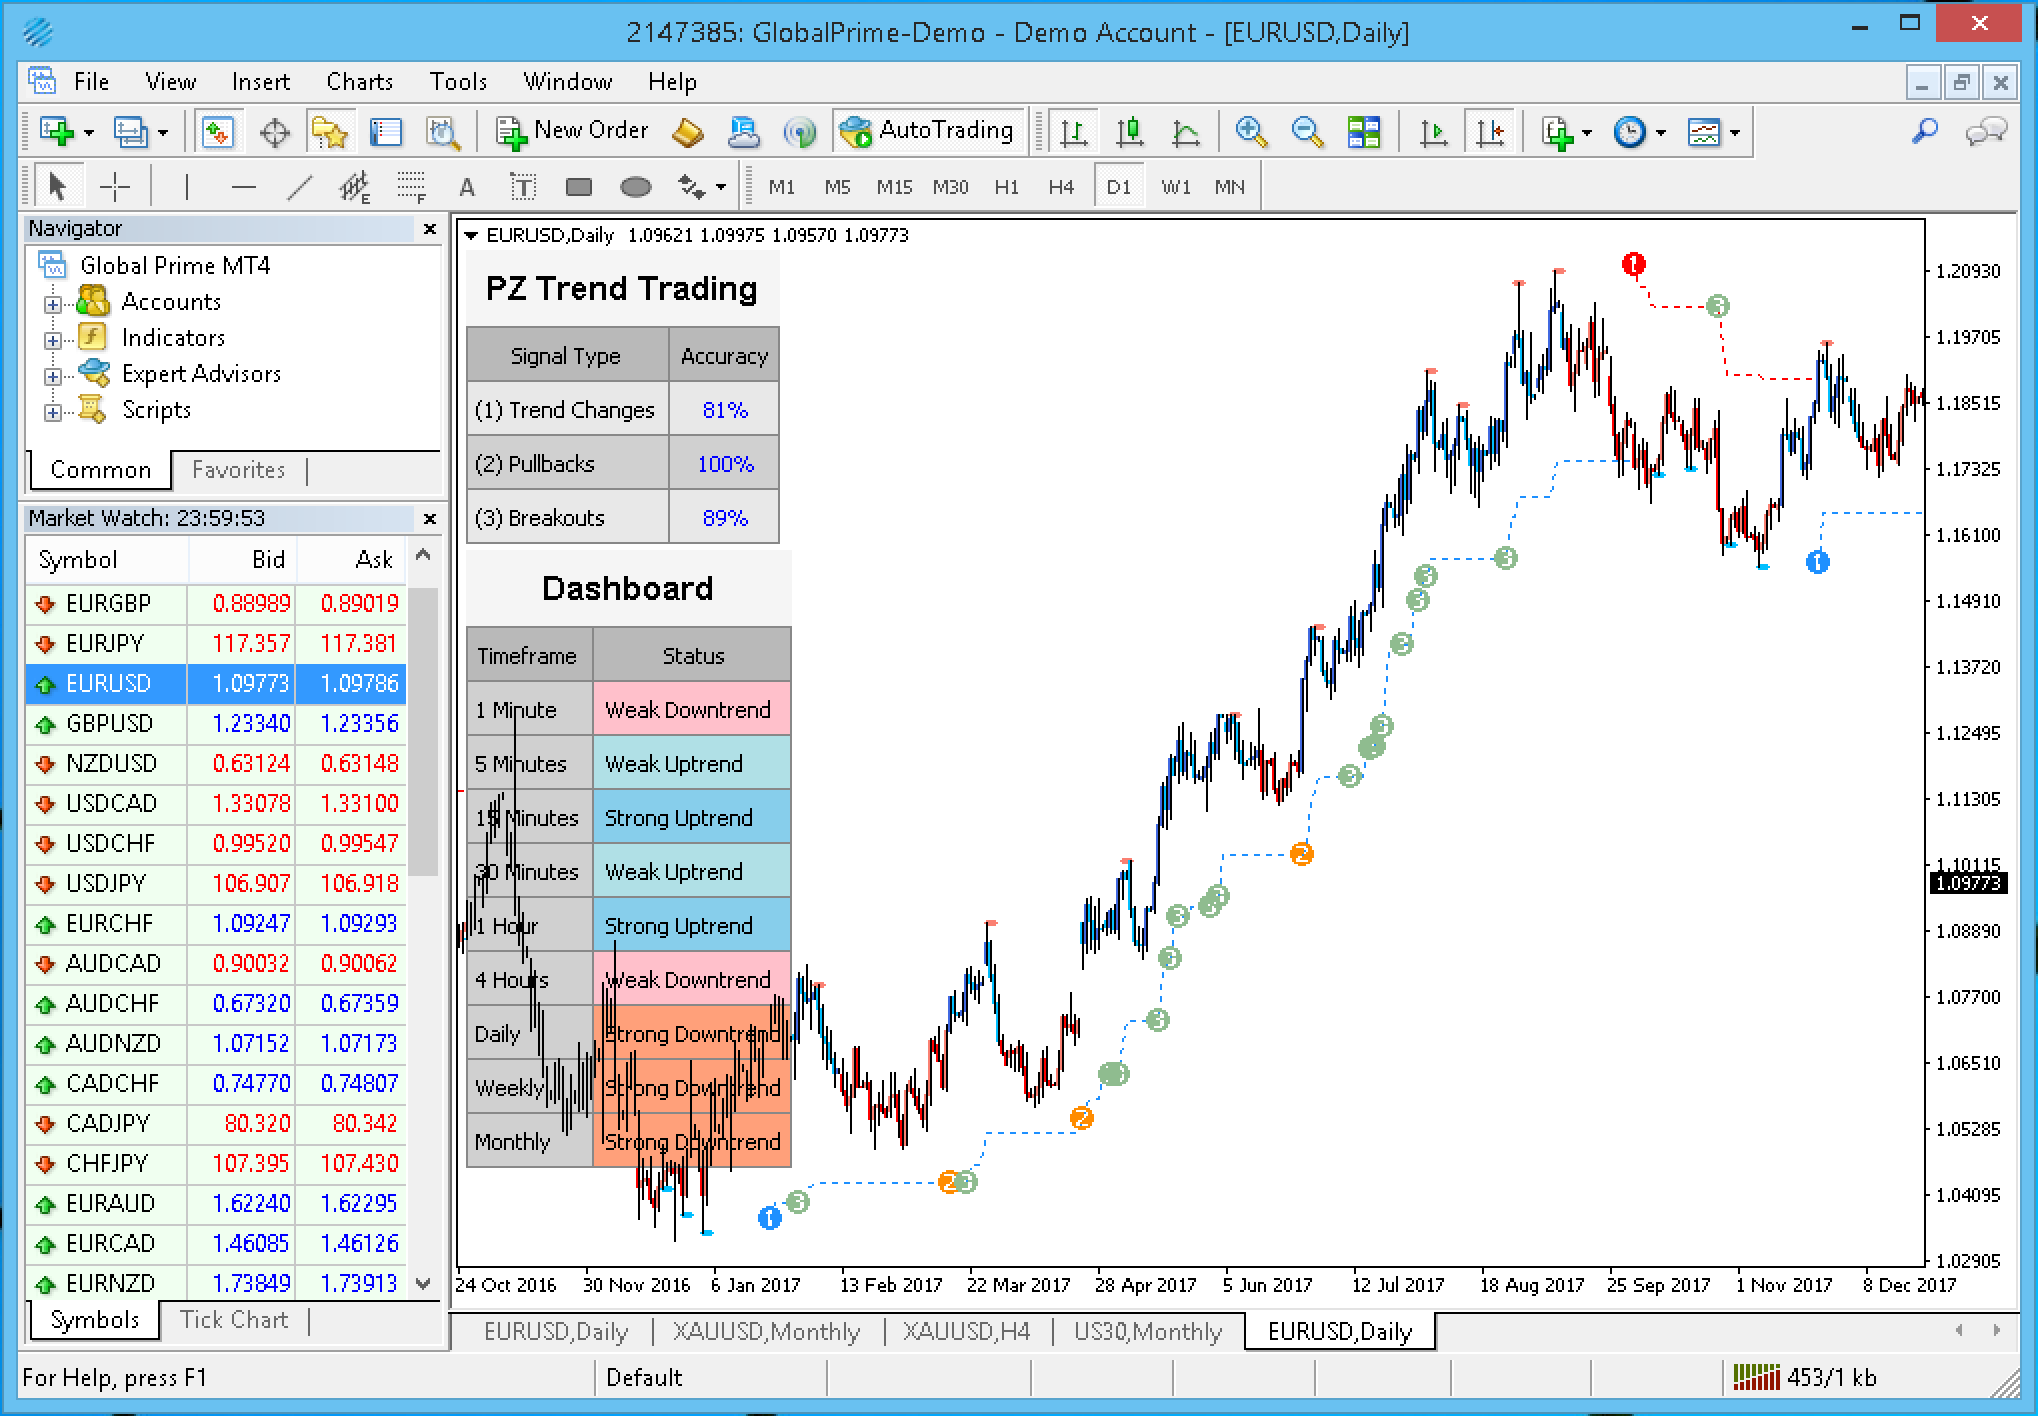 PZ Trend Trading Indicator